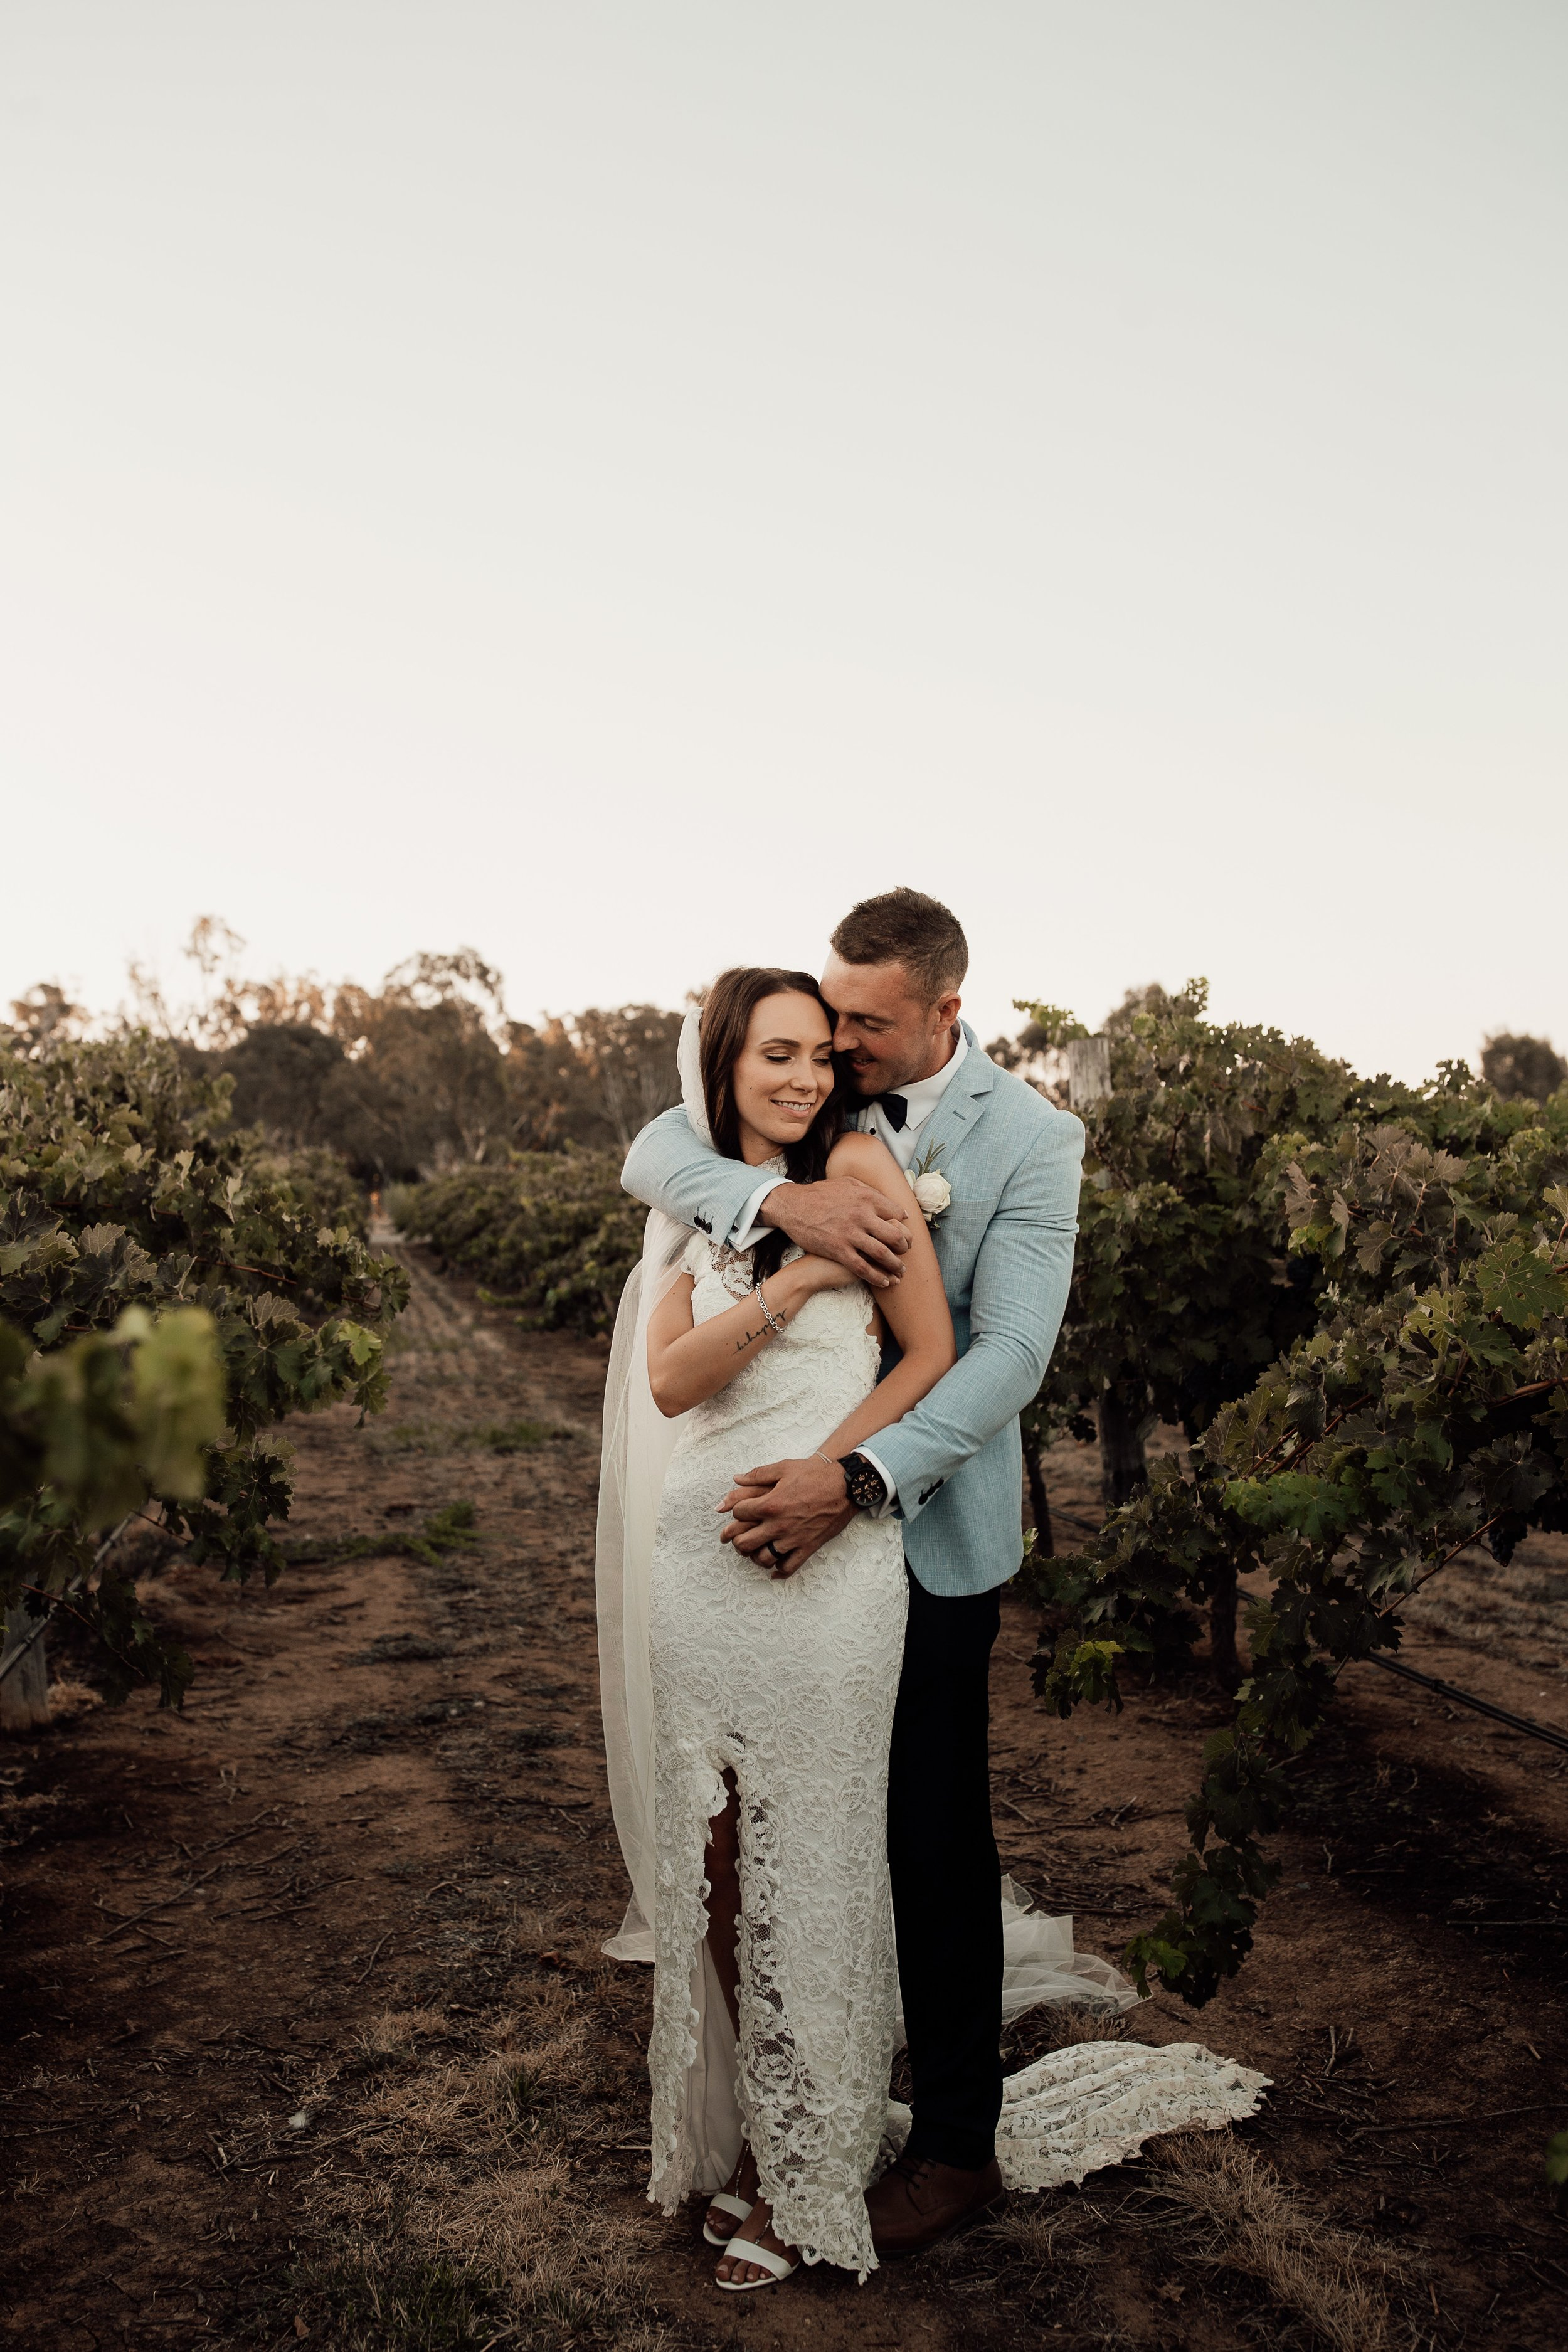 mickalathomas_puremacphotography_weddingphotographer_couplephotographer_Sheppartonphotographer_2916.jpg